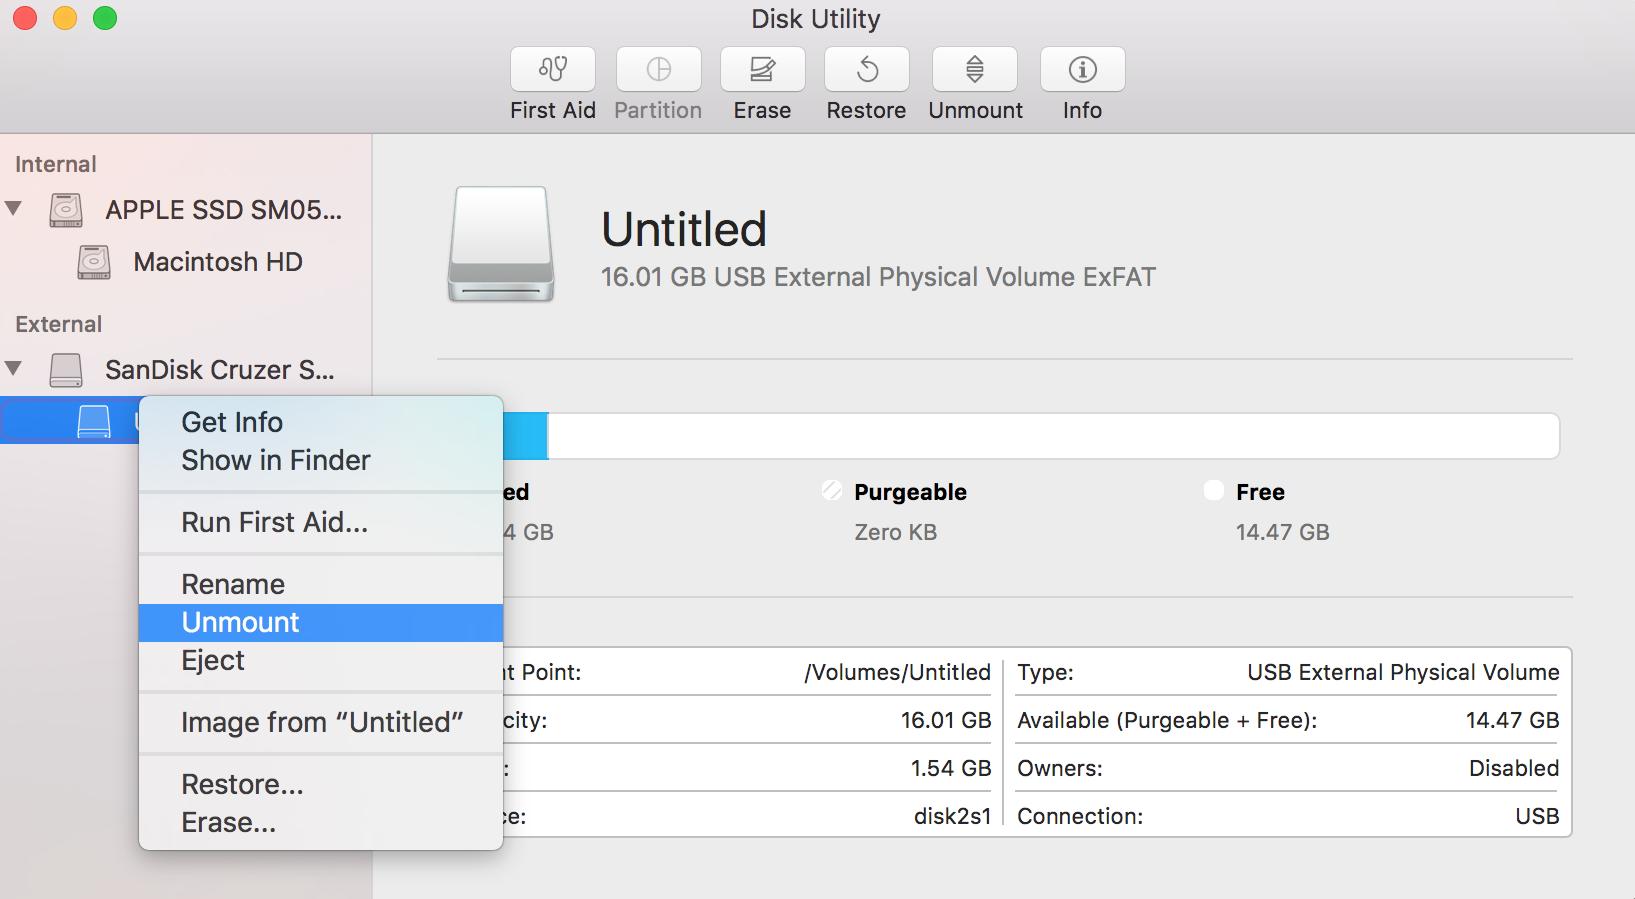 Disk Utility - Unmount